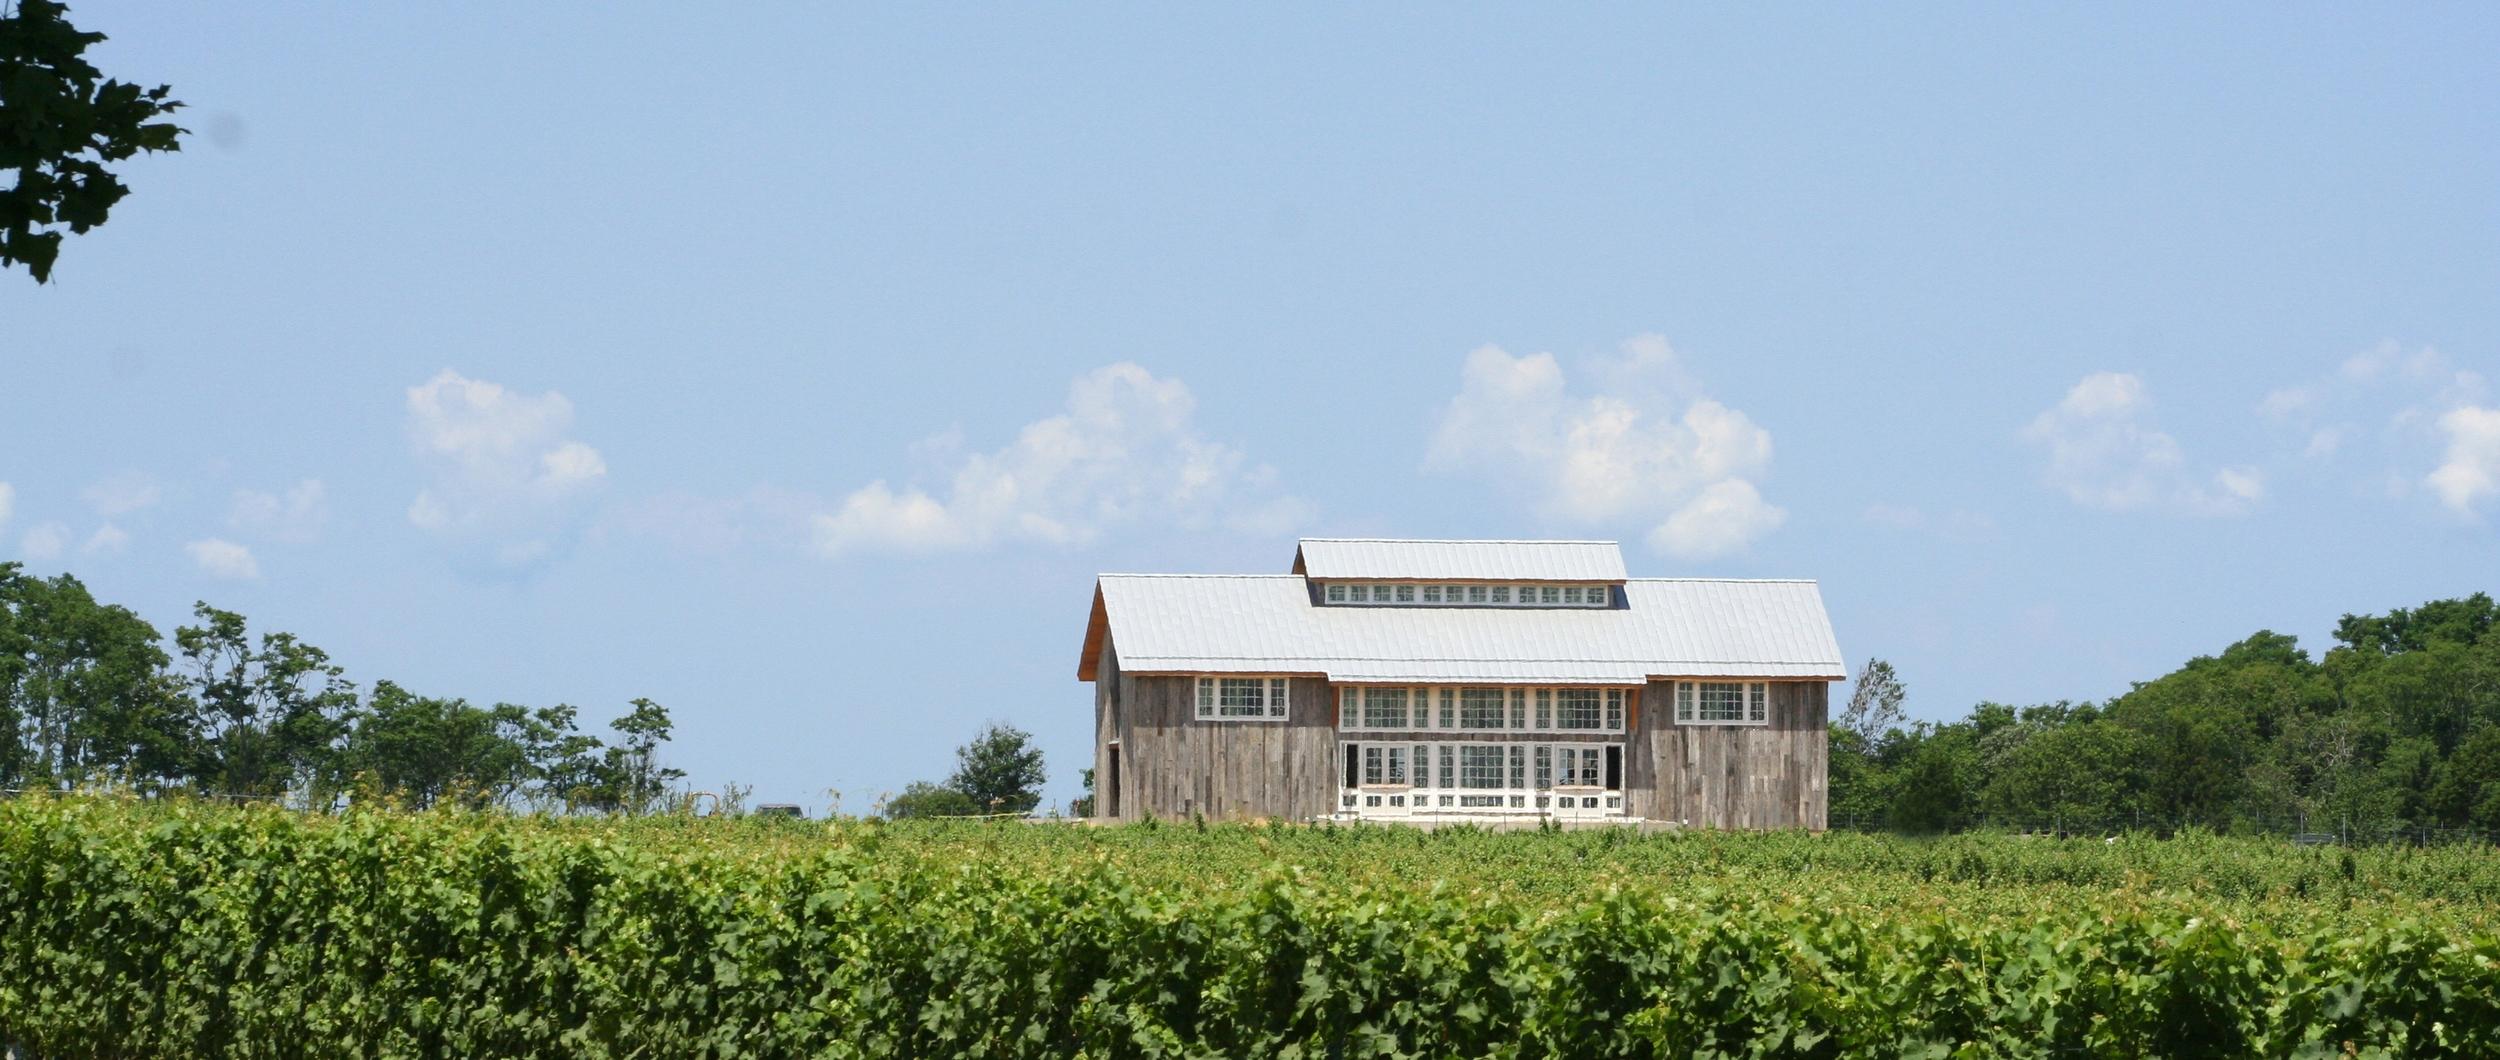 Kontokosta-wineryC.jpg